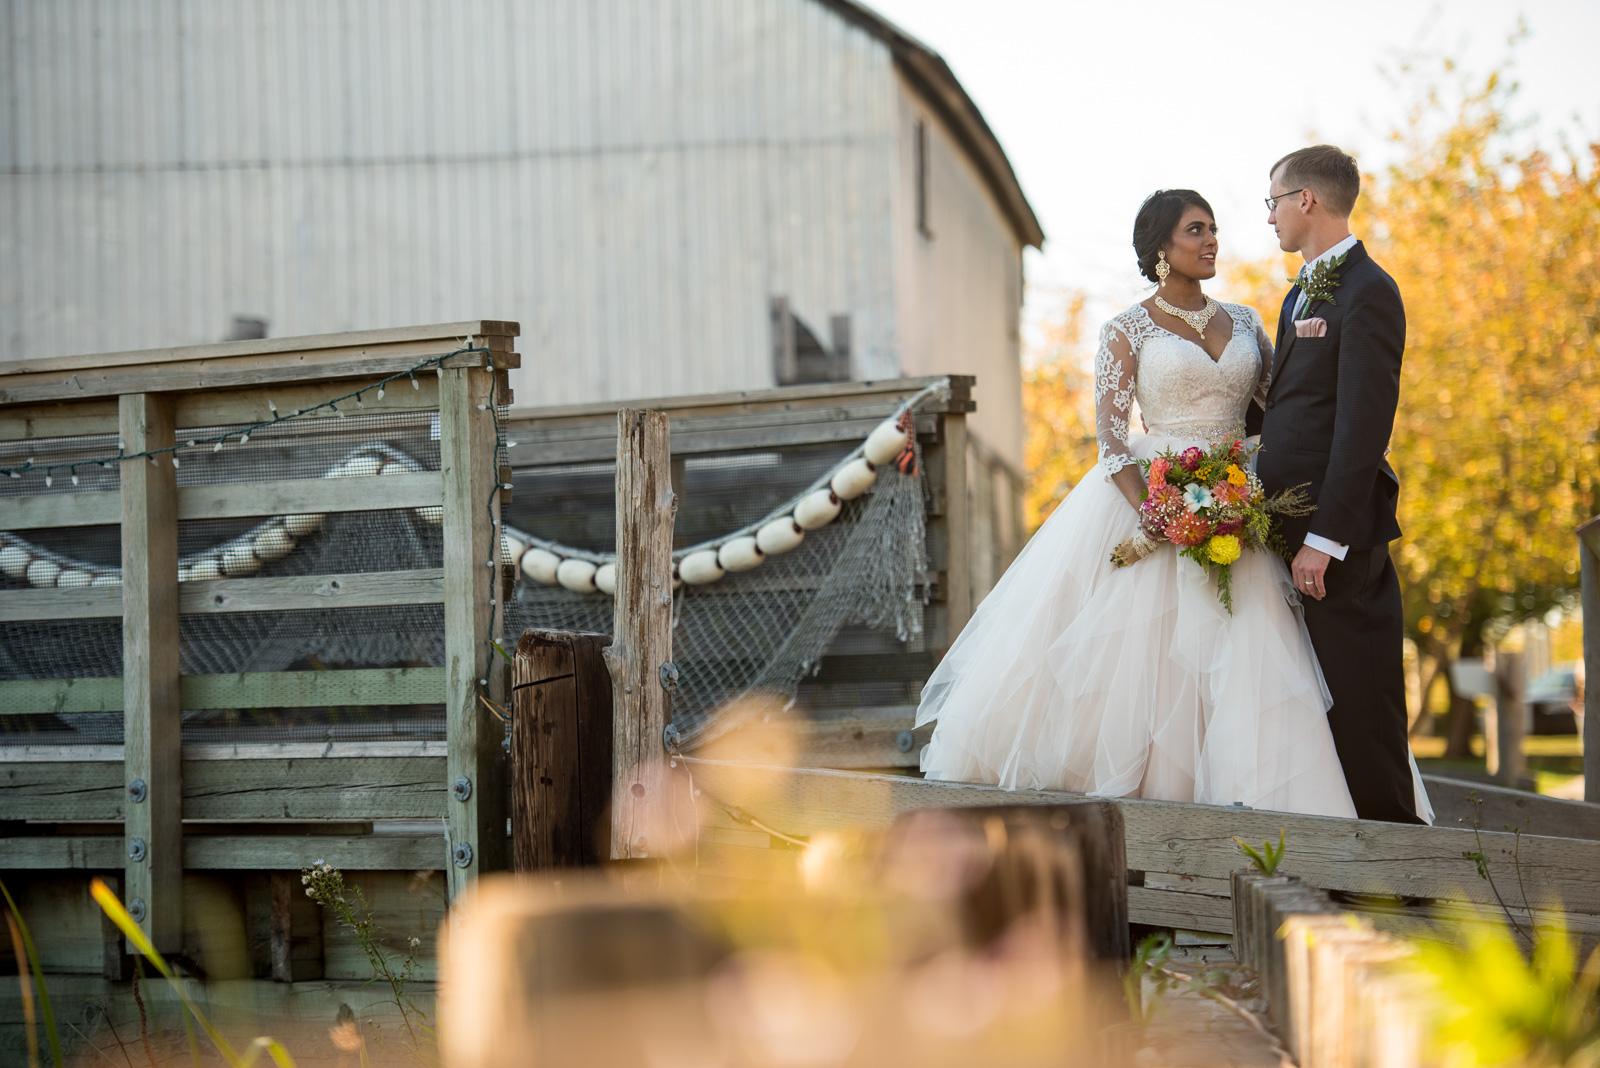 bc-wedding-photographers-paradise-banquet-hall-wedding-20.jpg